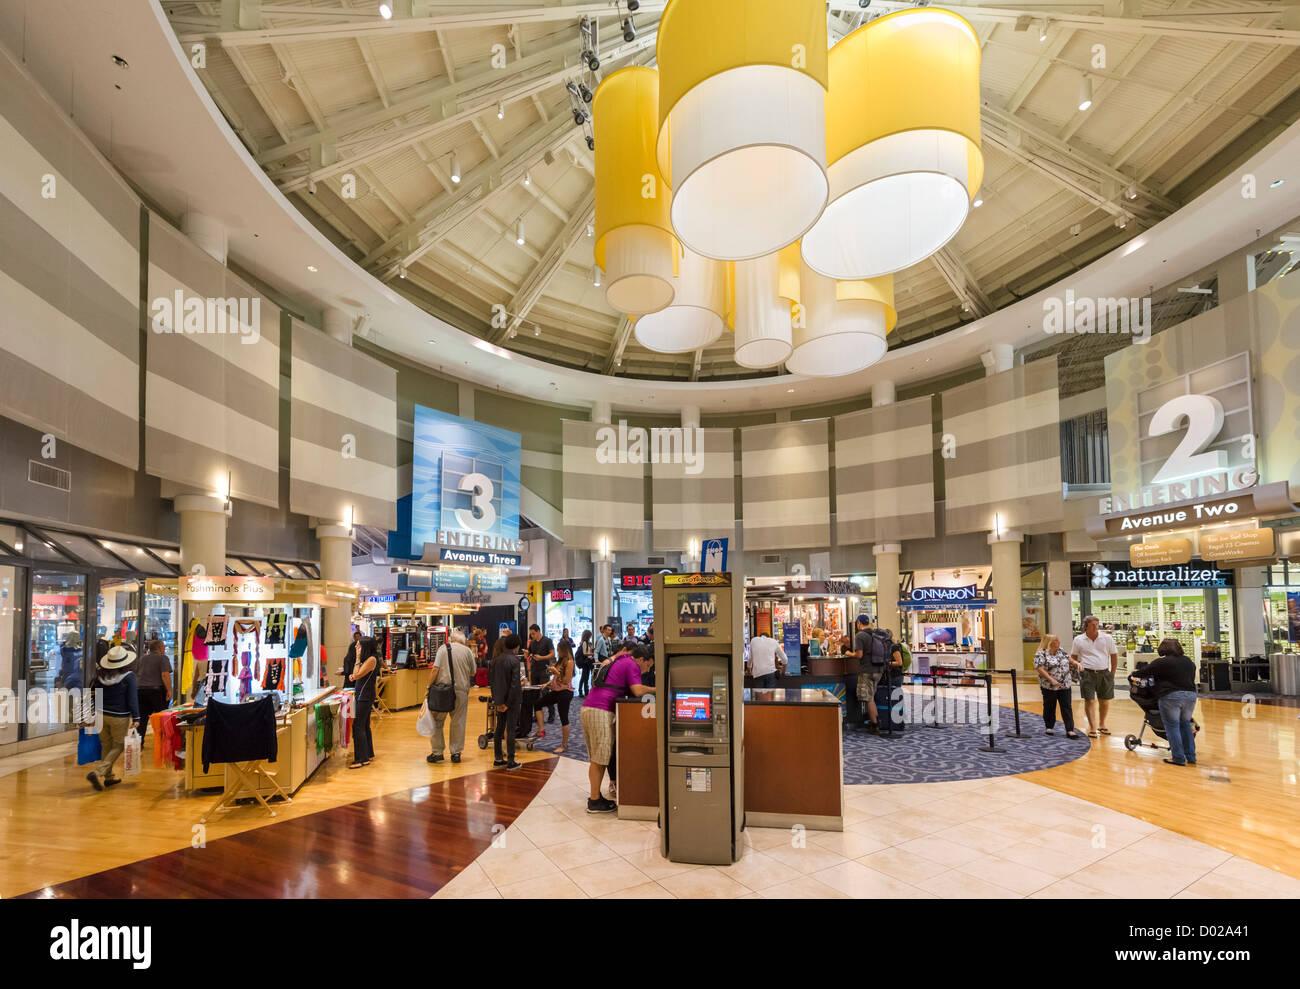 Innenraum der Sawgrass Mills Shopping Mall (das 2. größte in Florida), Sonnenaufgang, Broward County, Stockbild